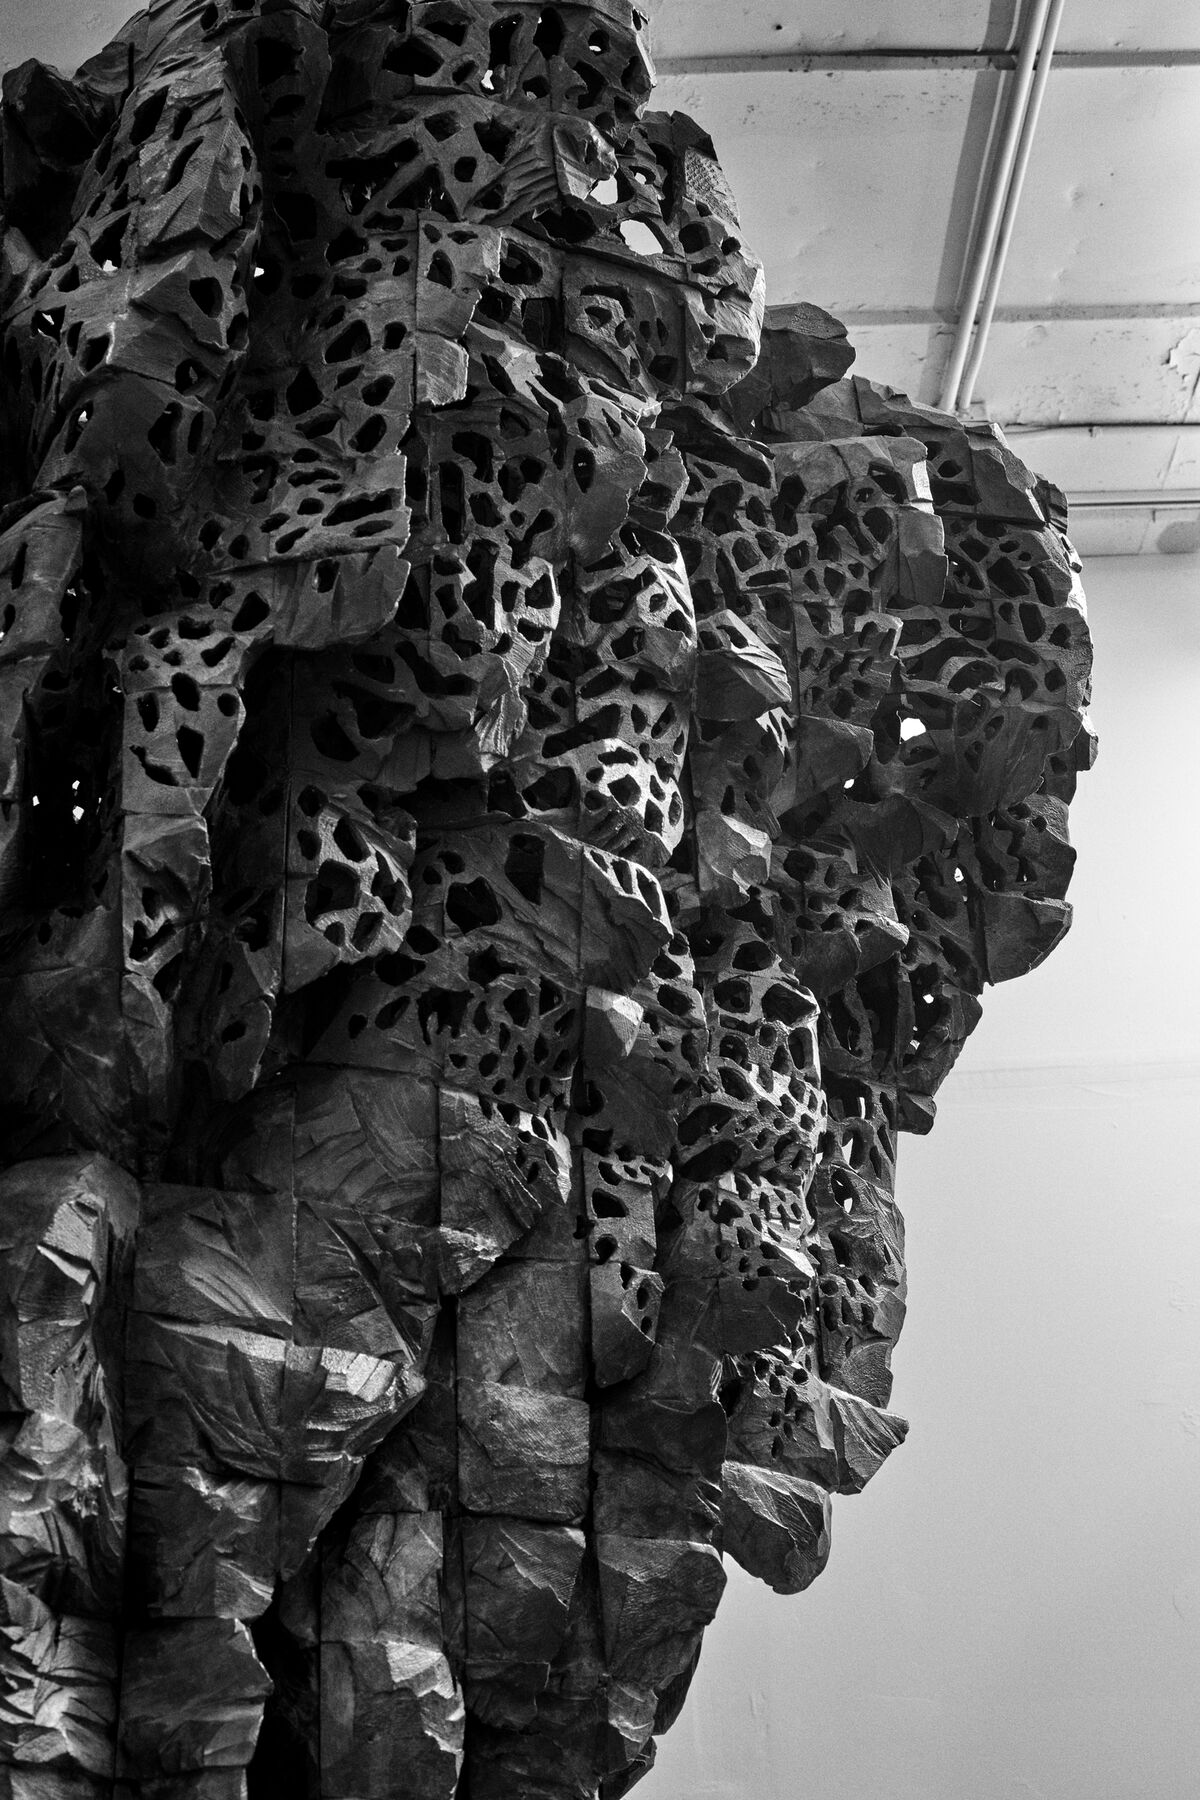 Detail of work by Ursula von Rydingsvard. Photo by Alex John Beck for Artsy